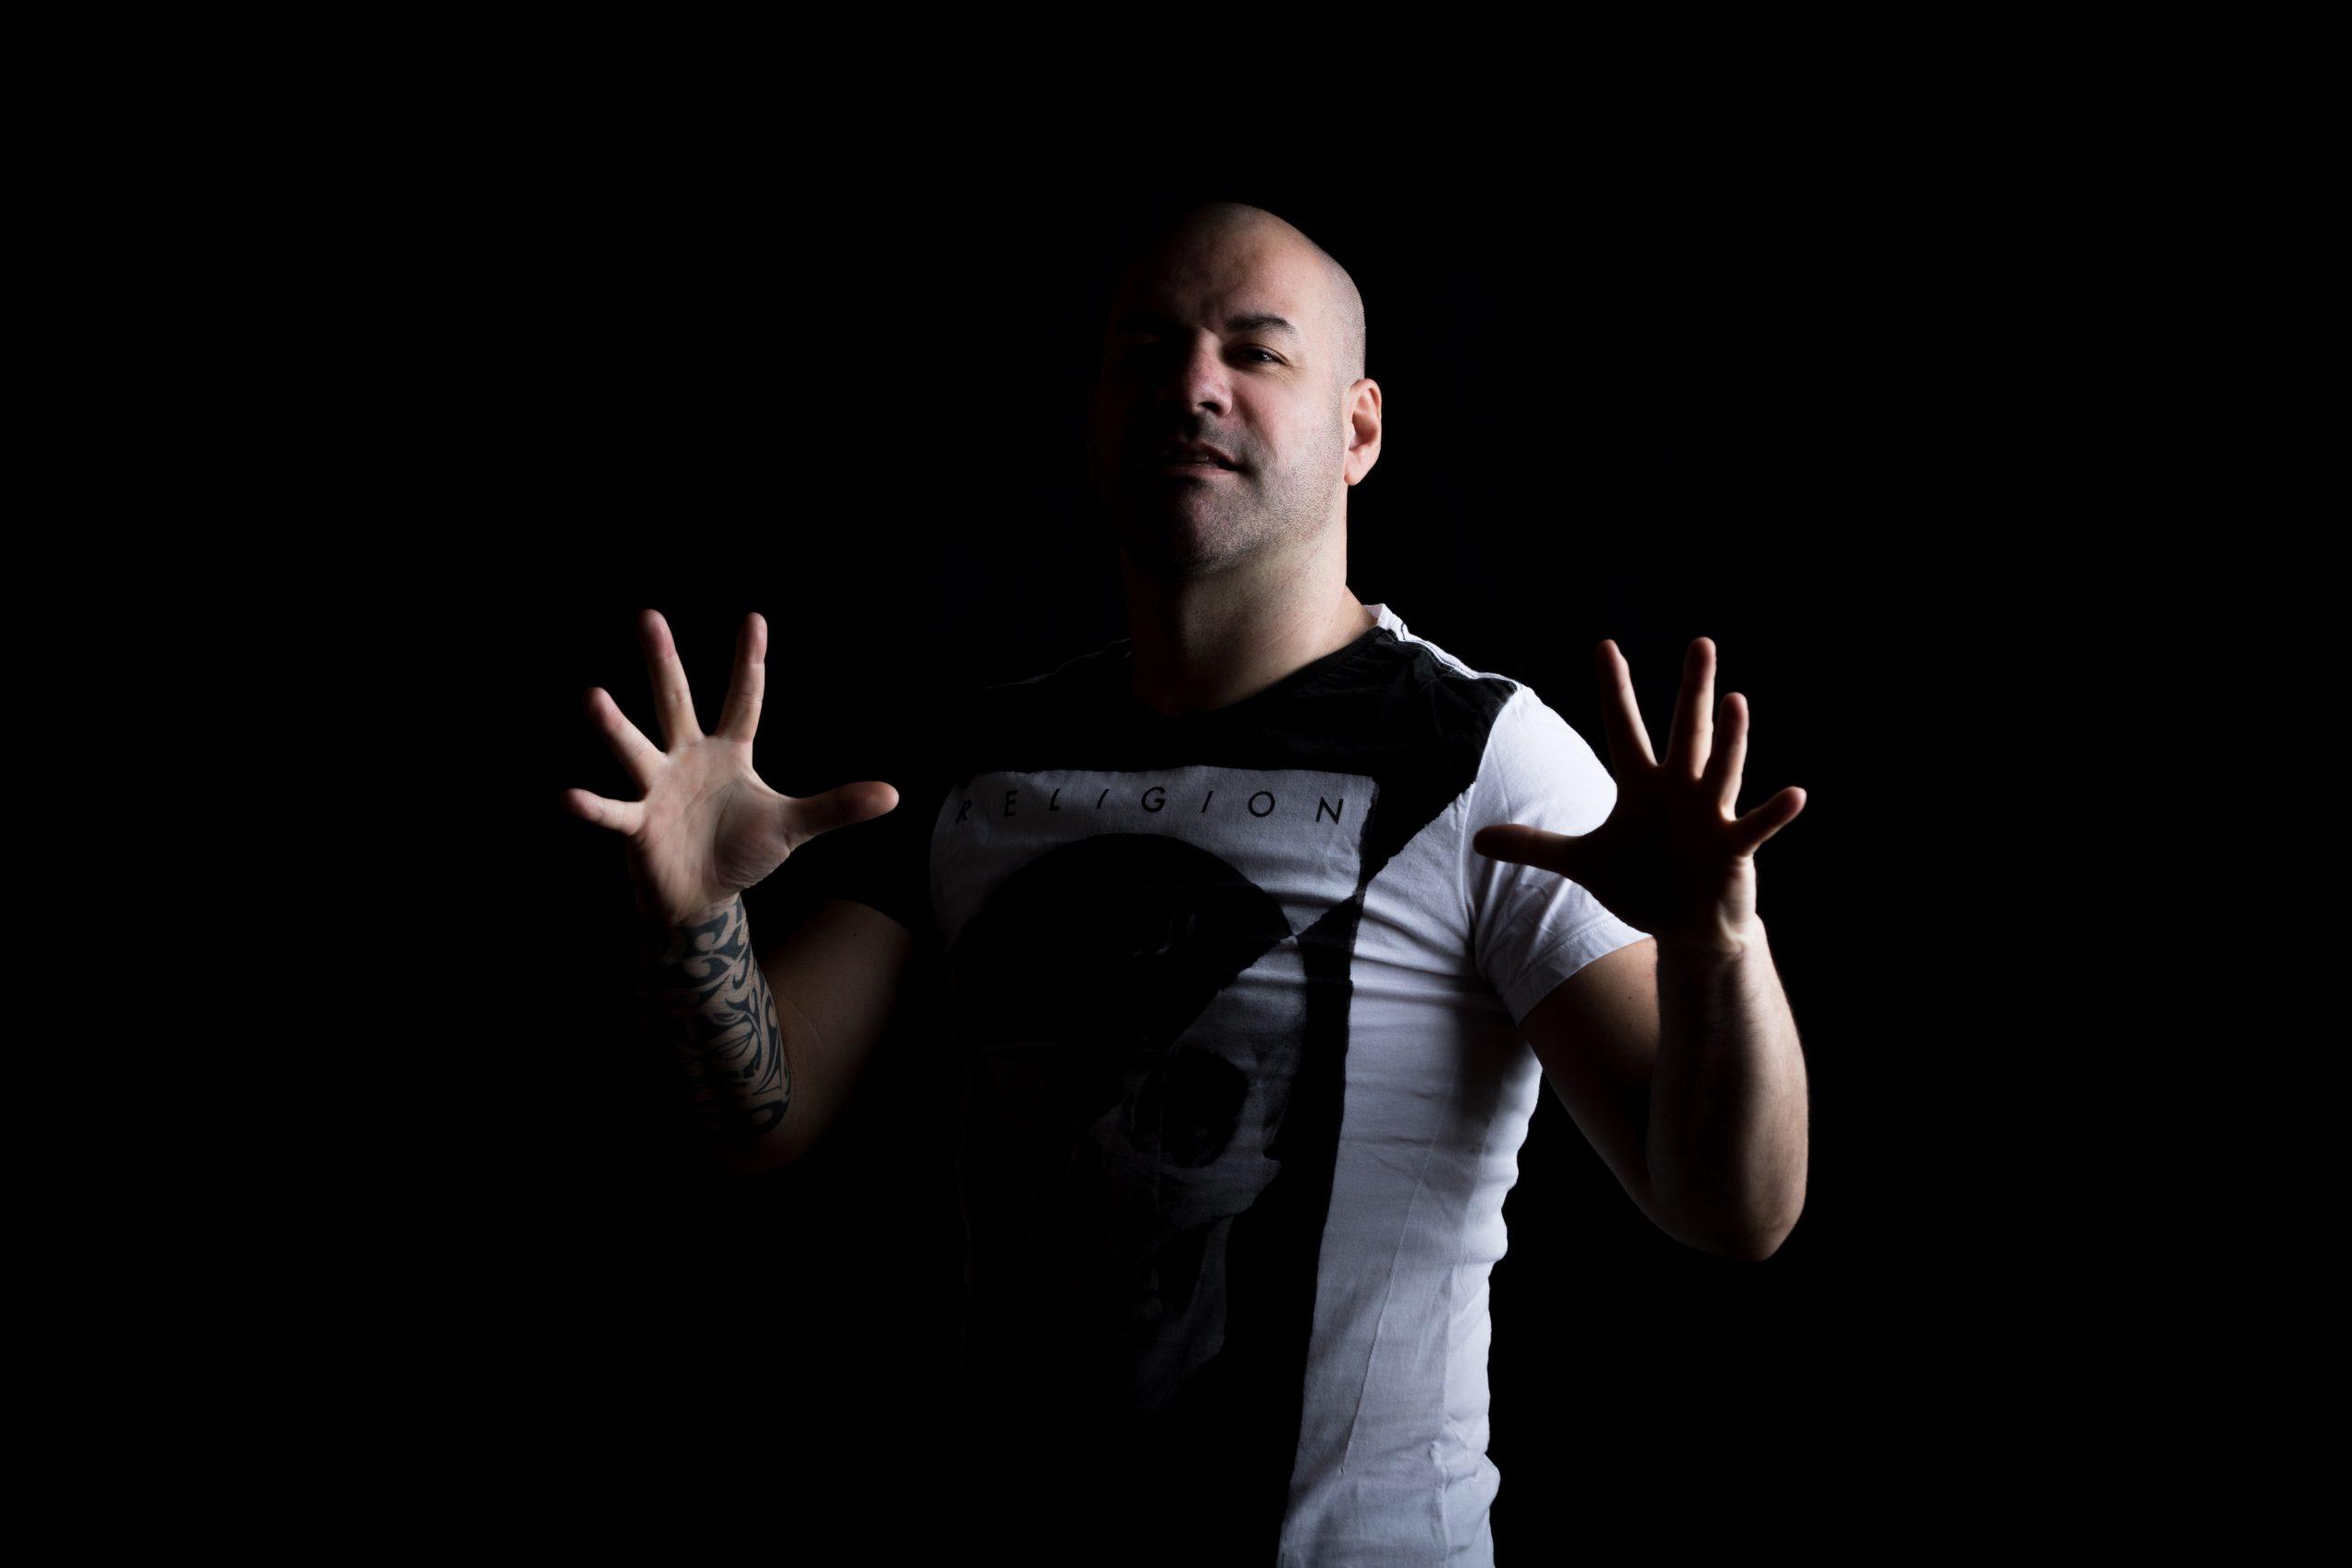 Alex Di Stefano vystoupí na začátku srpna v Praze